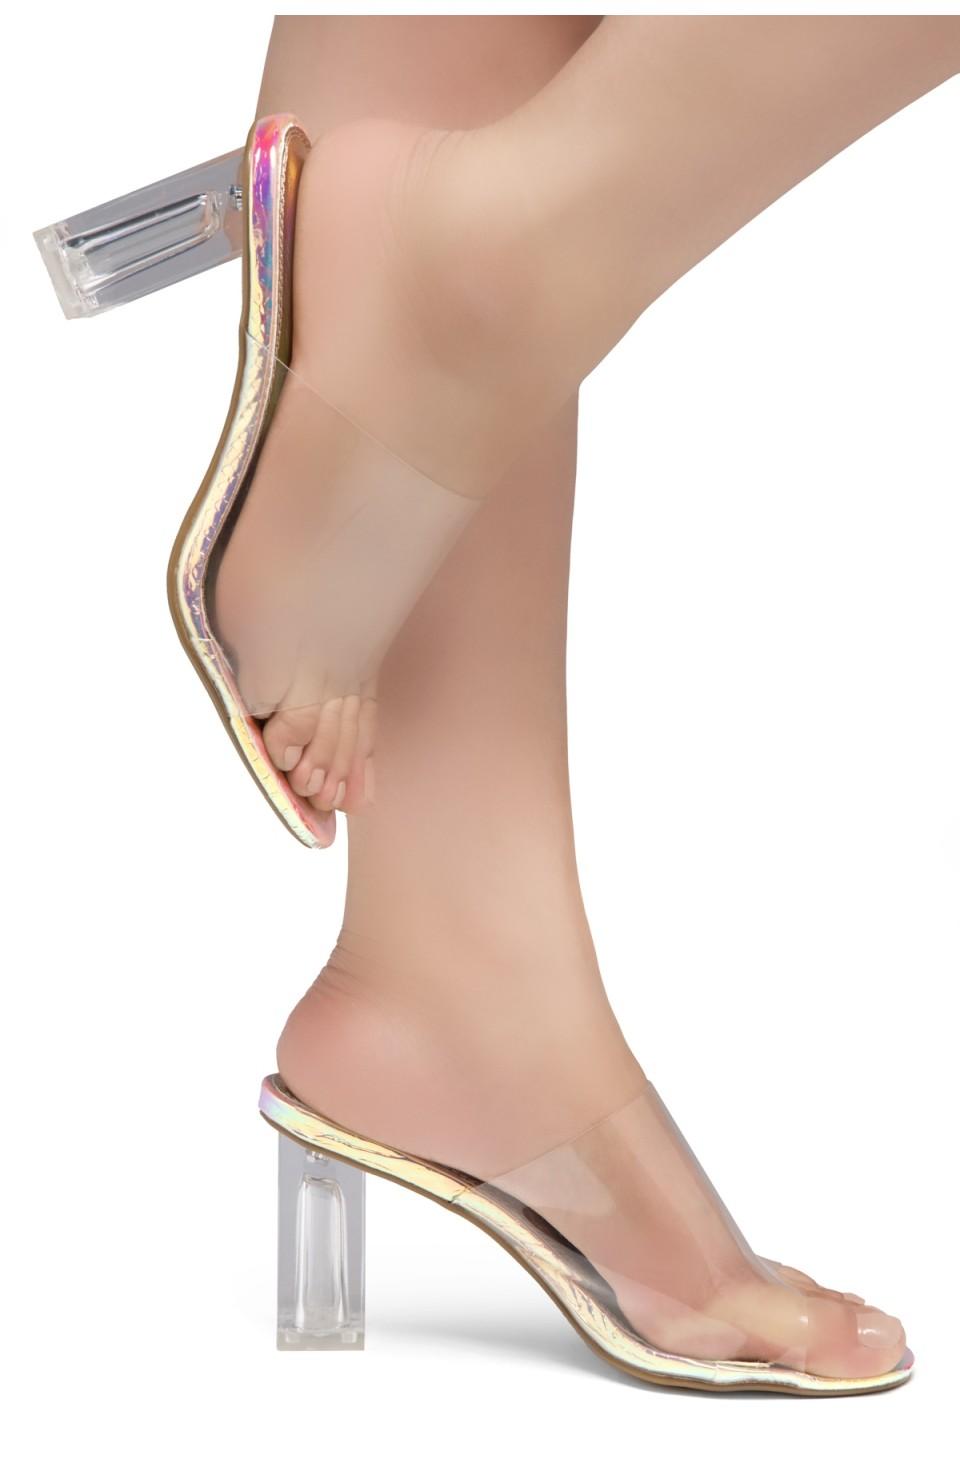 Shoe Land Cllaary-L Perspex heel, Slide On Sandals(2010 CLR/RAINBOWSNK)